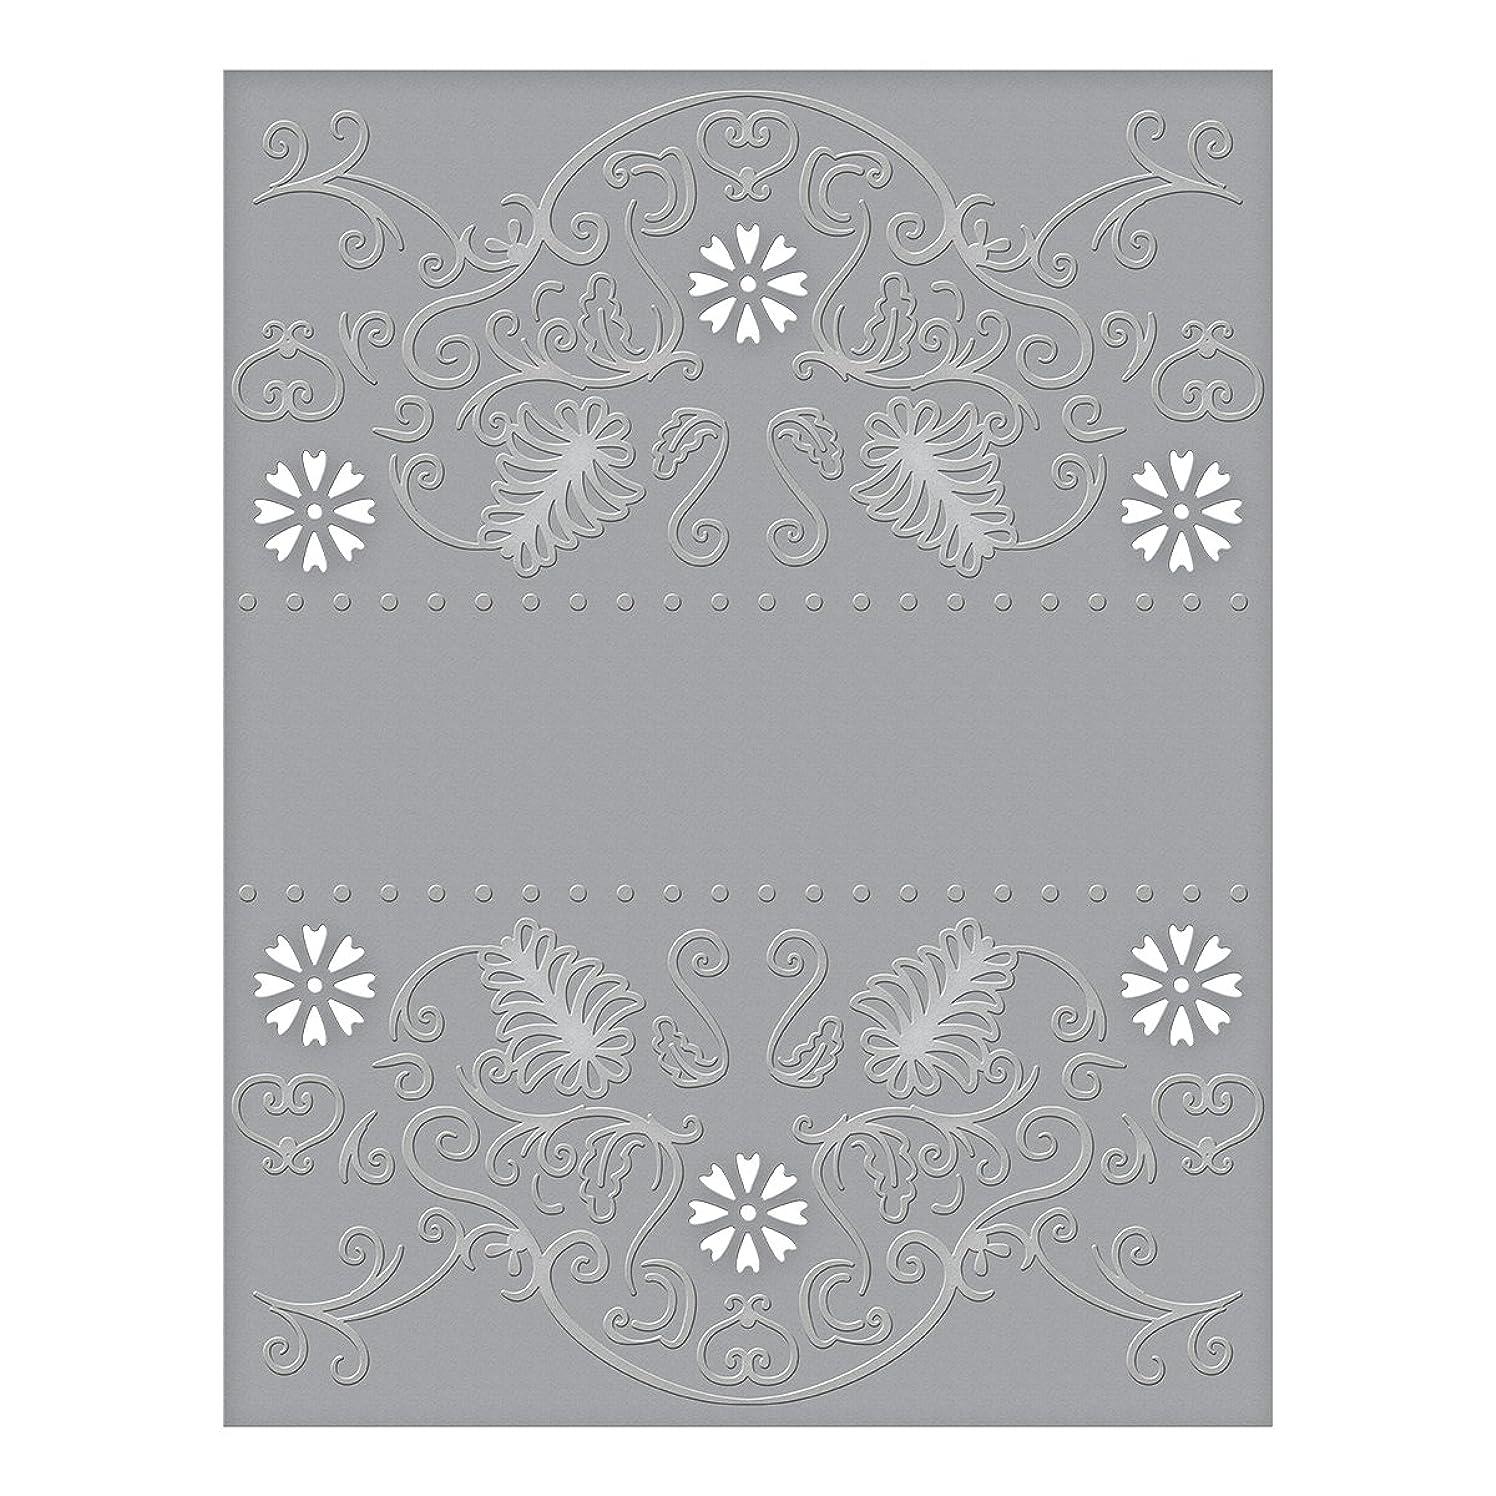 Spellbinders CEF-009 Flora Banner Cut and Emboss Folder